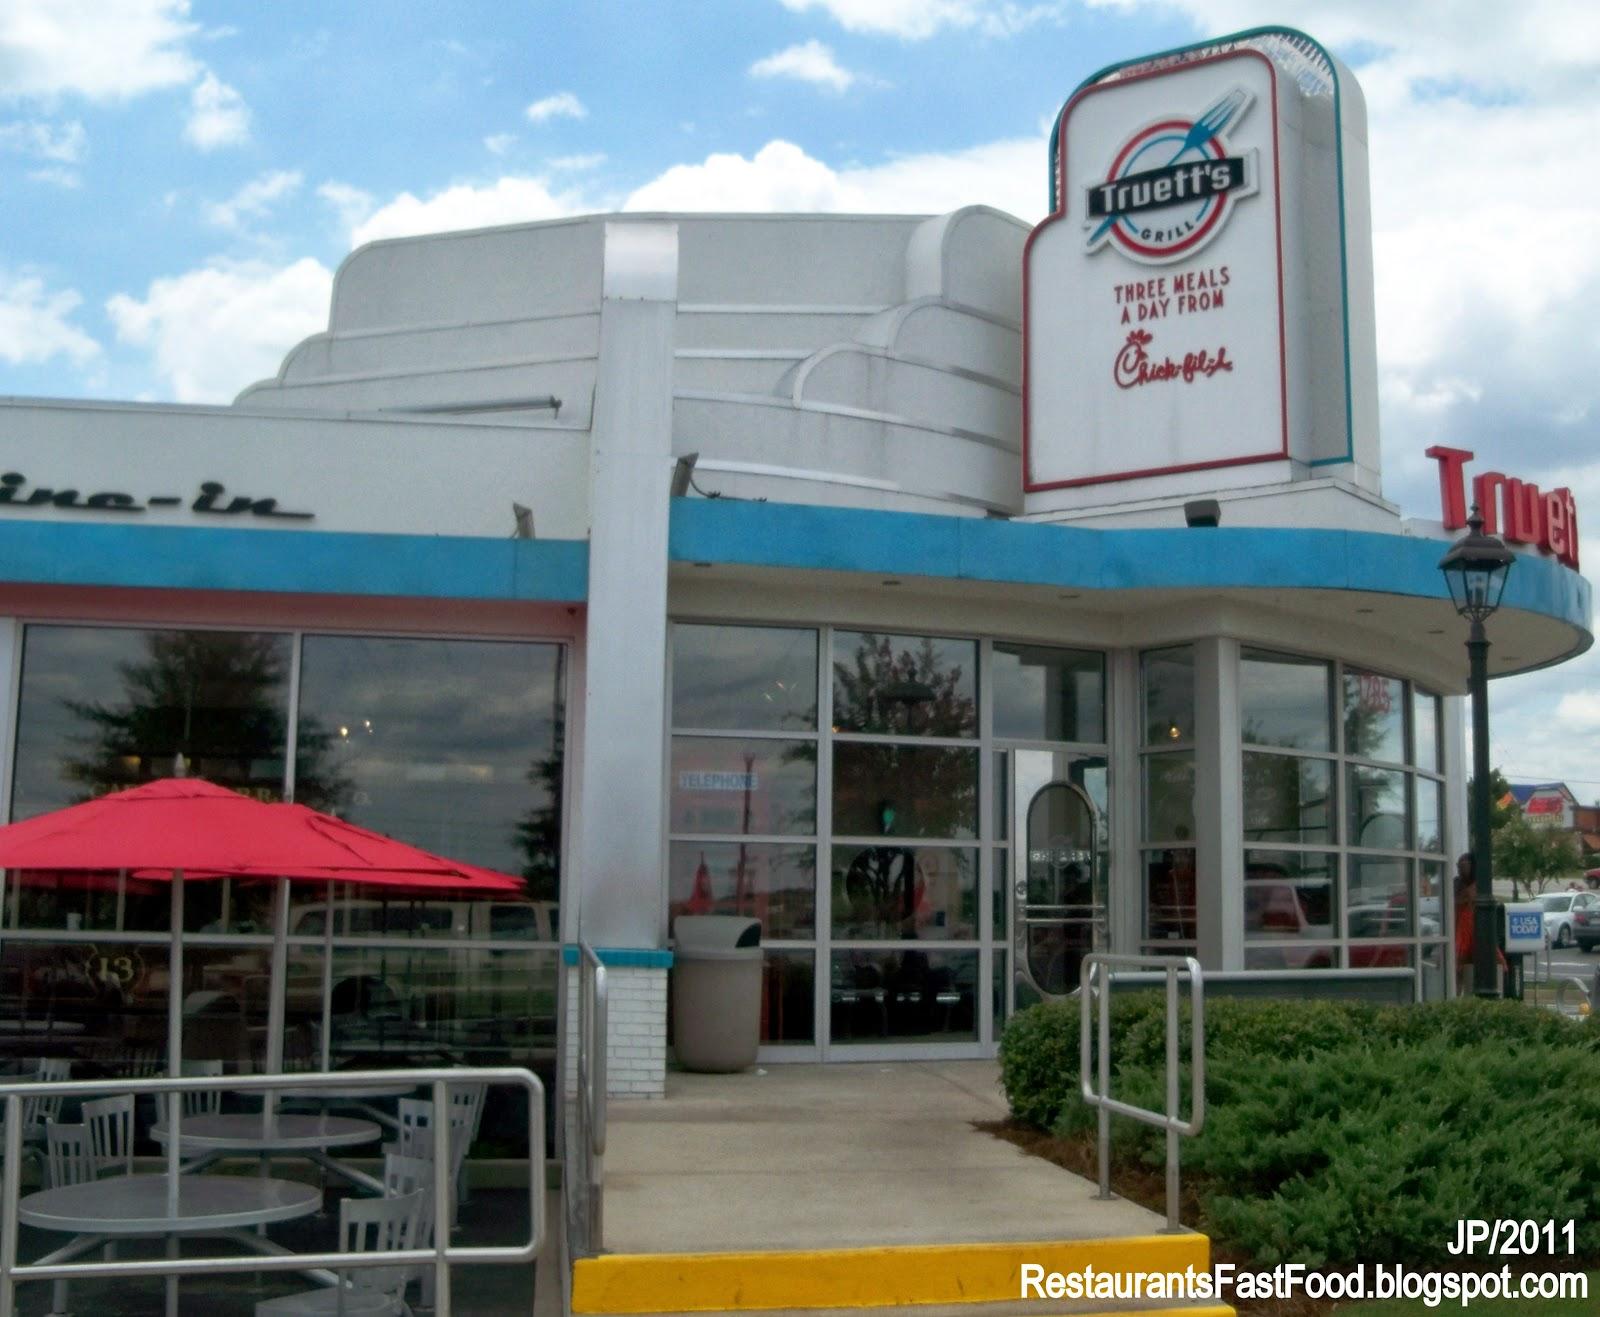 Truett S Grill Mcdonough Georgia Fil A Restaurant Three Meala Day From Henry County Ga